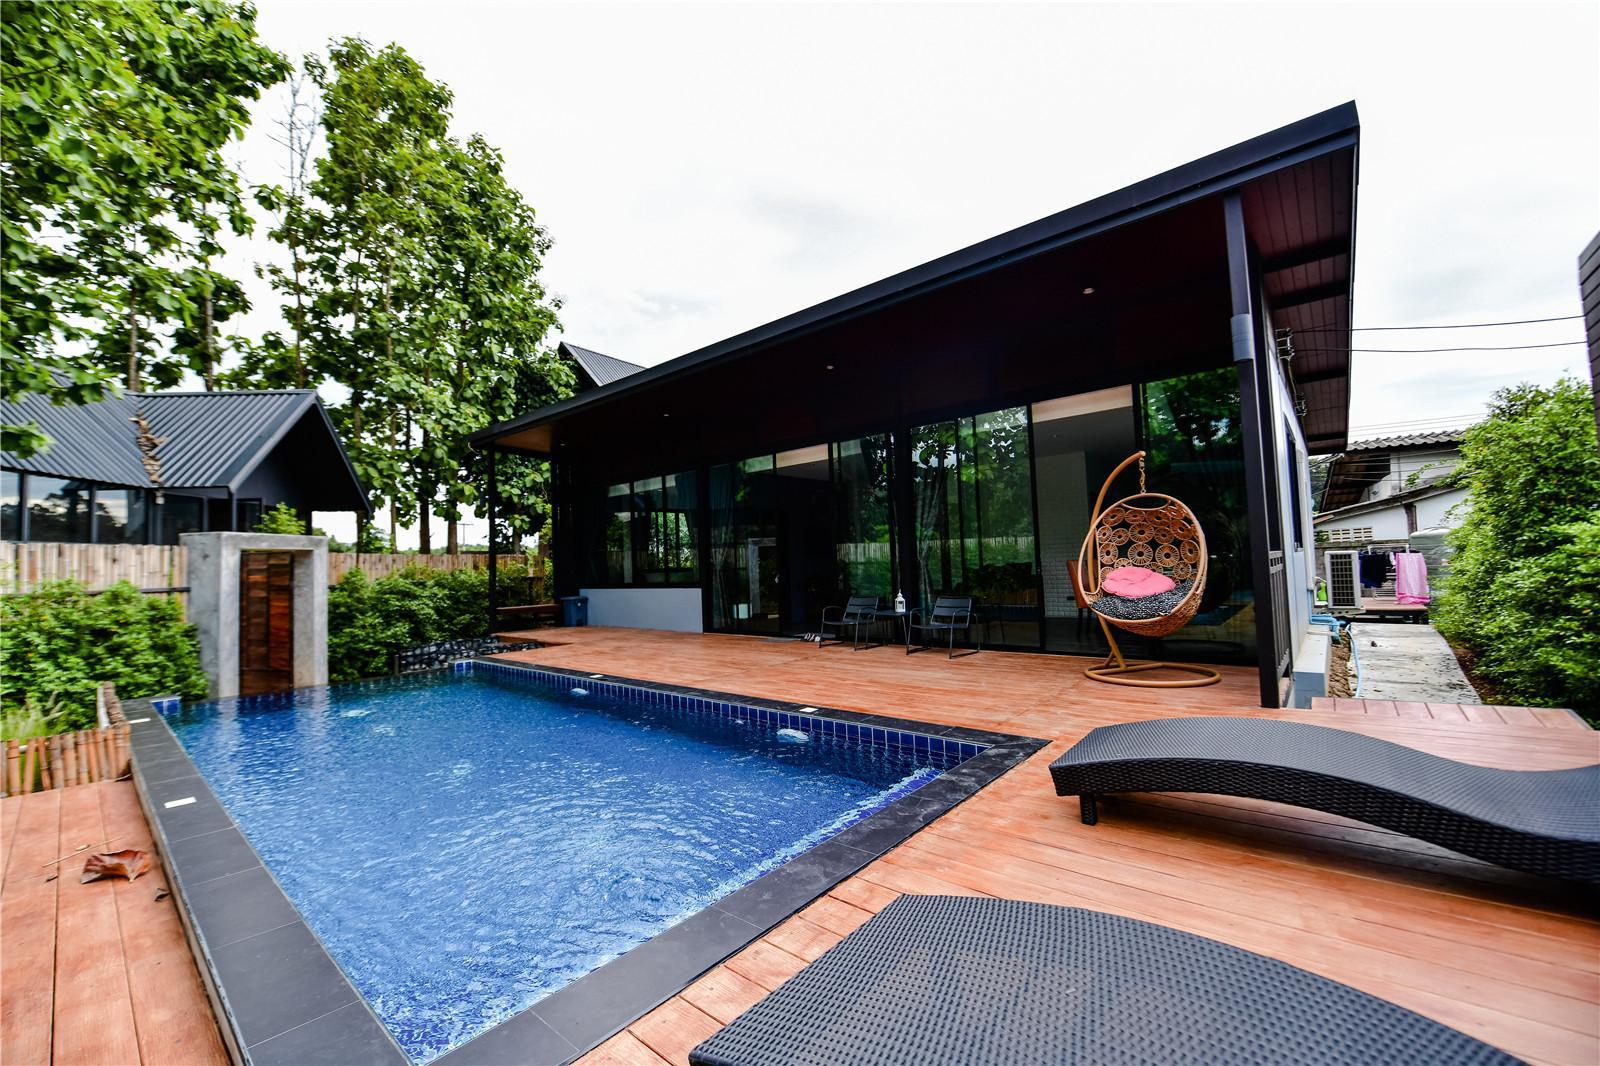 Hot spring Gardenscape pool villa / 2BR วิลลา 2 ห้องนอน 3 ห้องน้ำส่วนตัว ขนาด 288 ตร.ม. – ดอยสะเก็ด